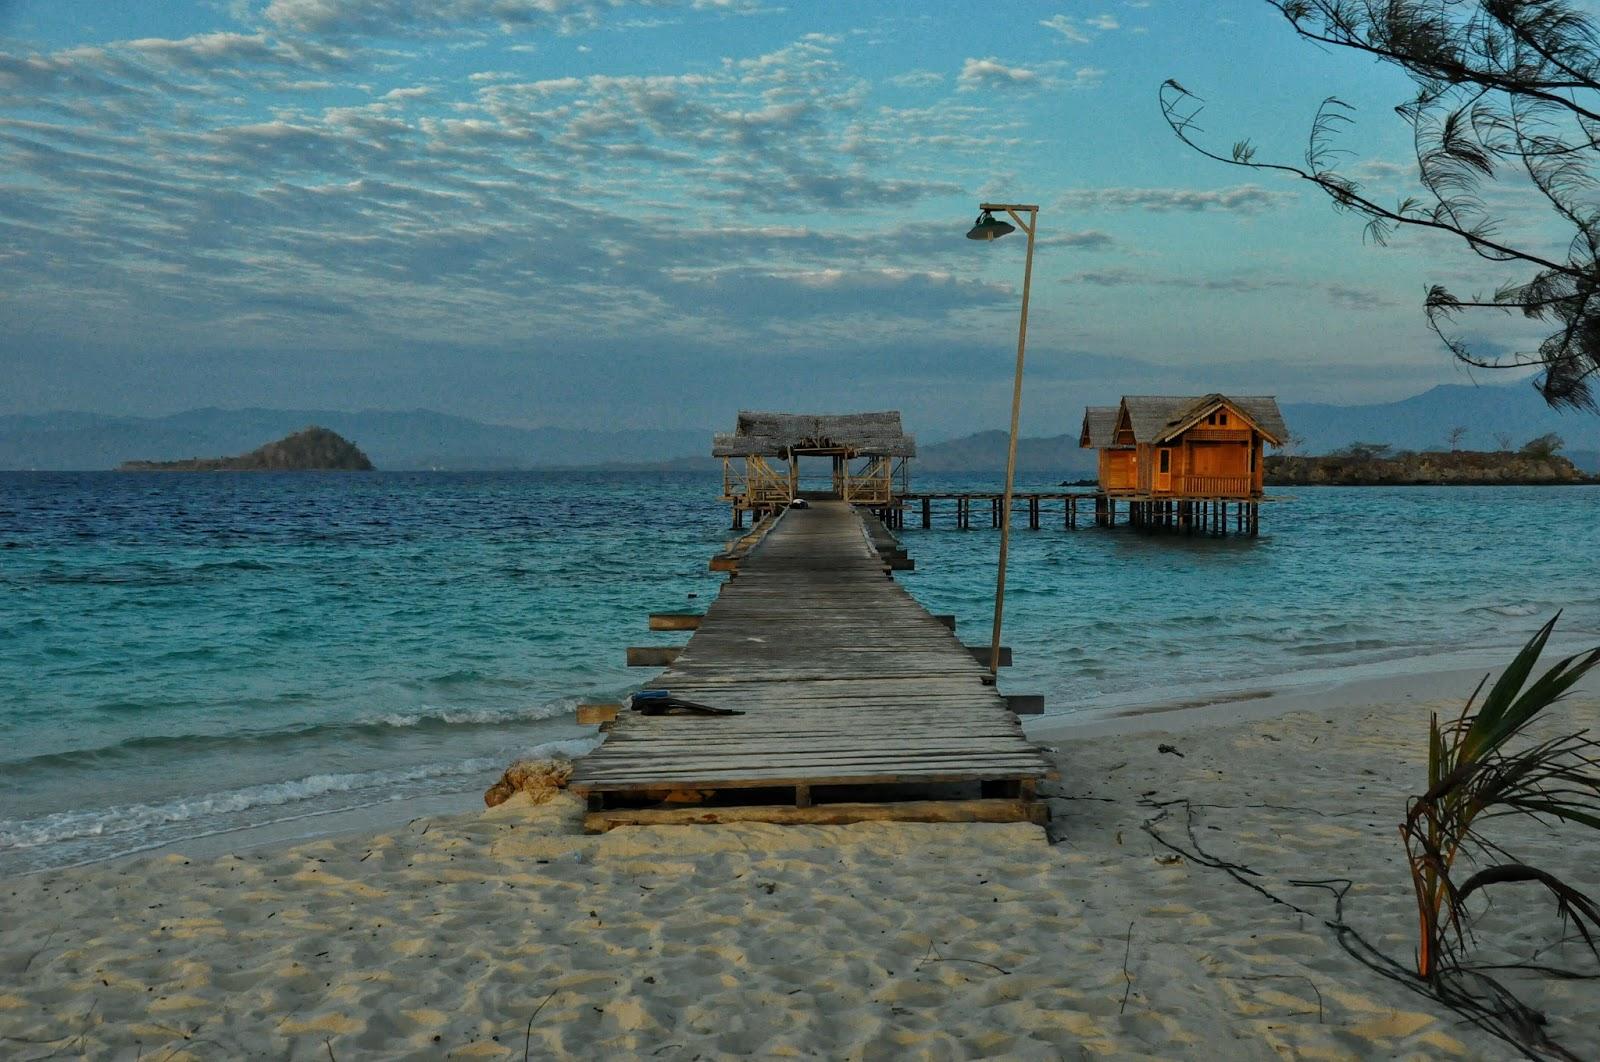 Mei 2015 Kakigatal Pulau Saronde Wisata Pantai Pasir Putih Menawan